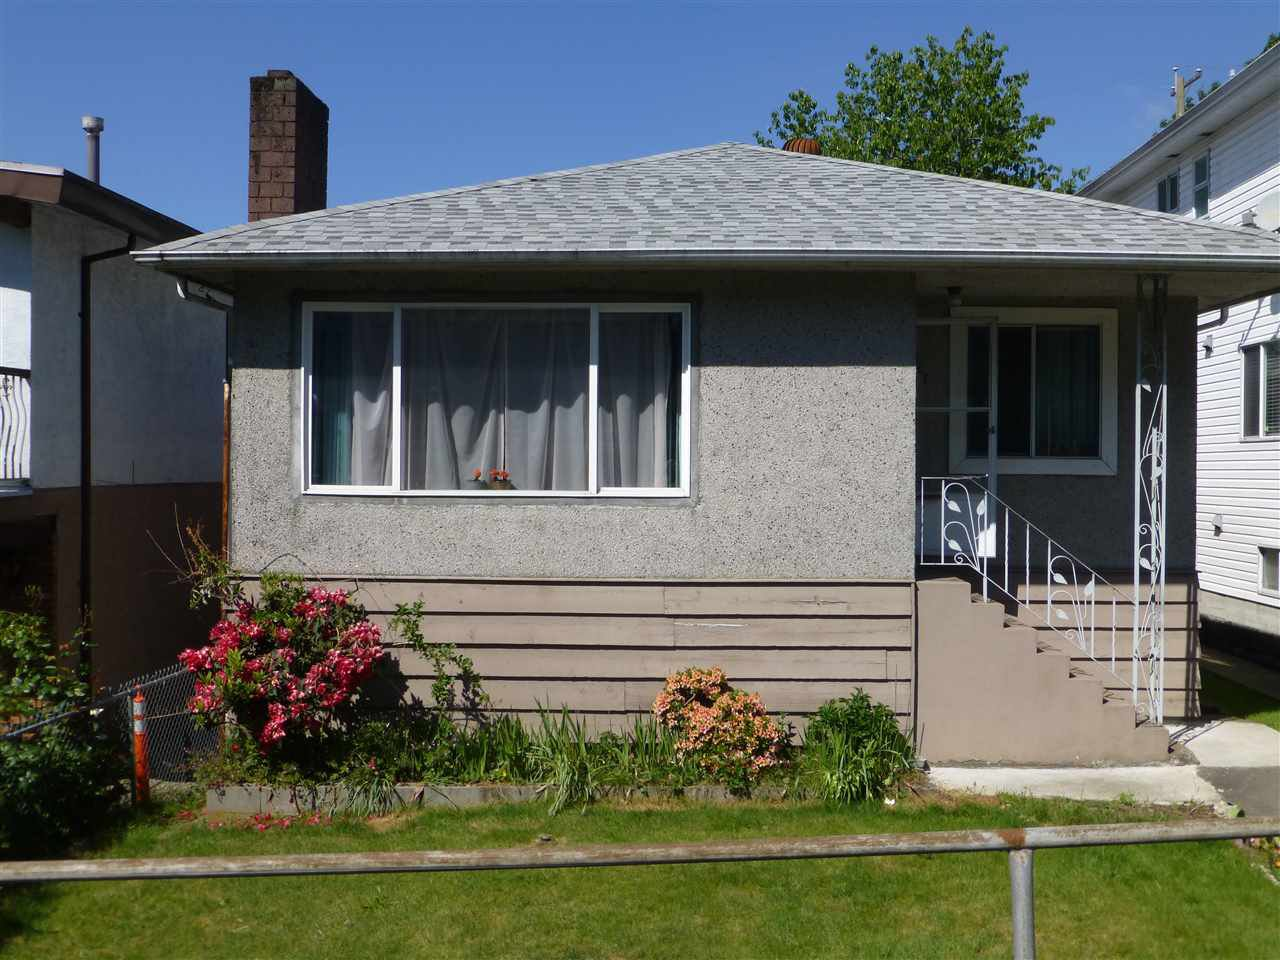 Main Photo: 2617 RENFREW Street in Vancouver: Renfrew VE House for sale (Vancouver East)  : MLS®# R2067434